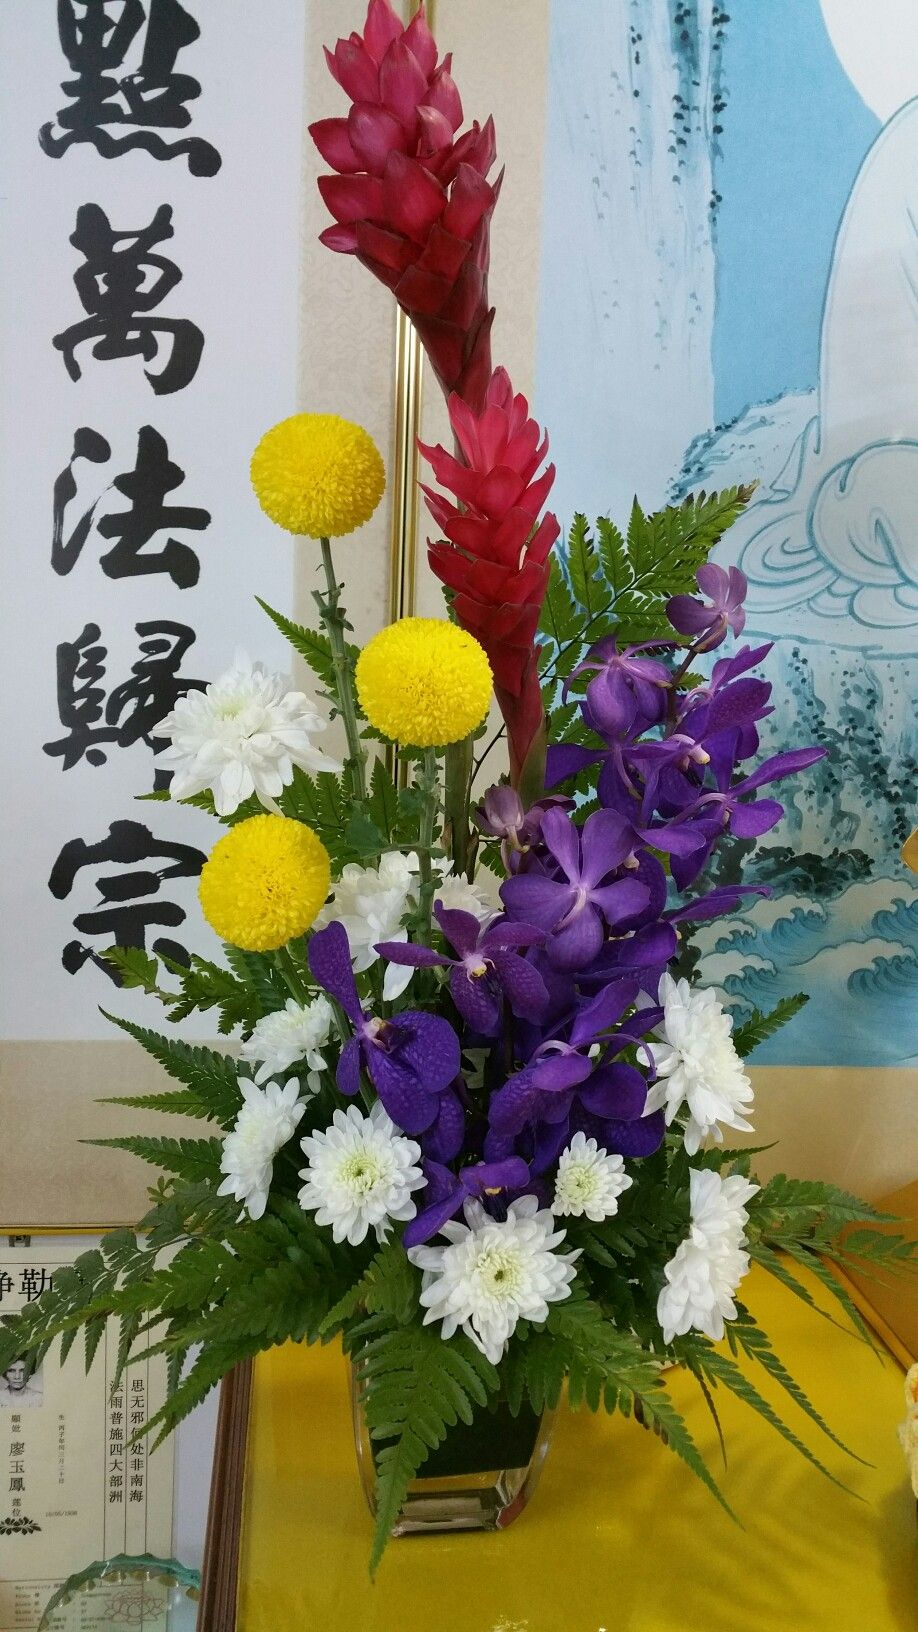 Pin oleh Aries Foo di 花花世界 Anggrek, Bunga